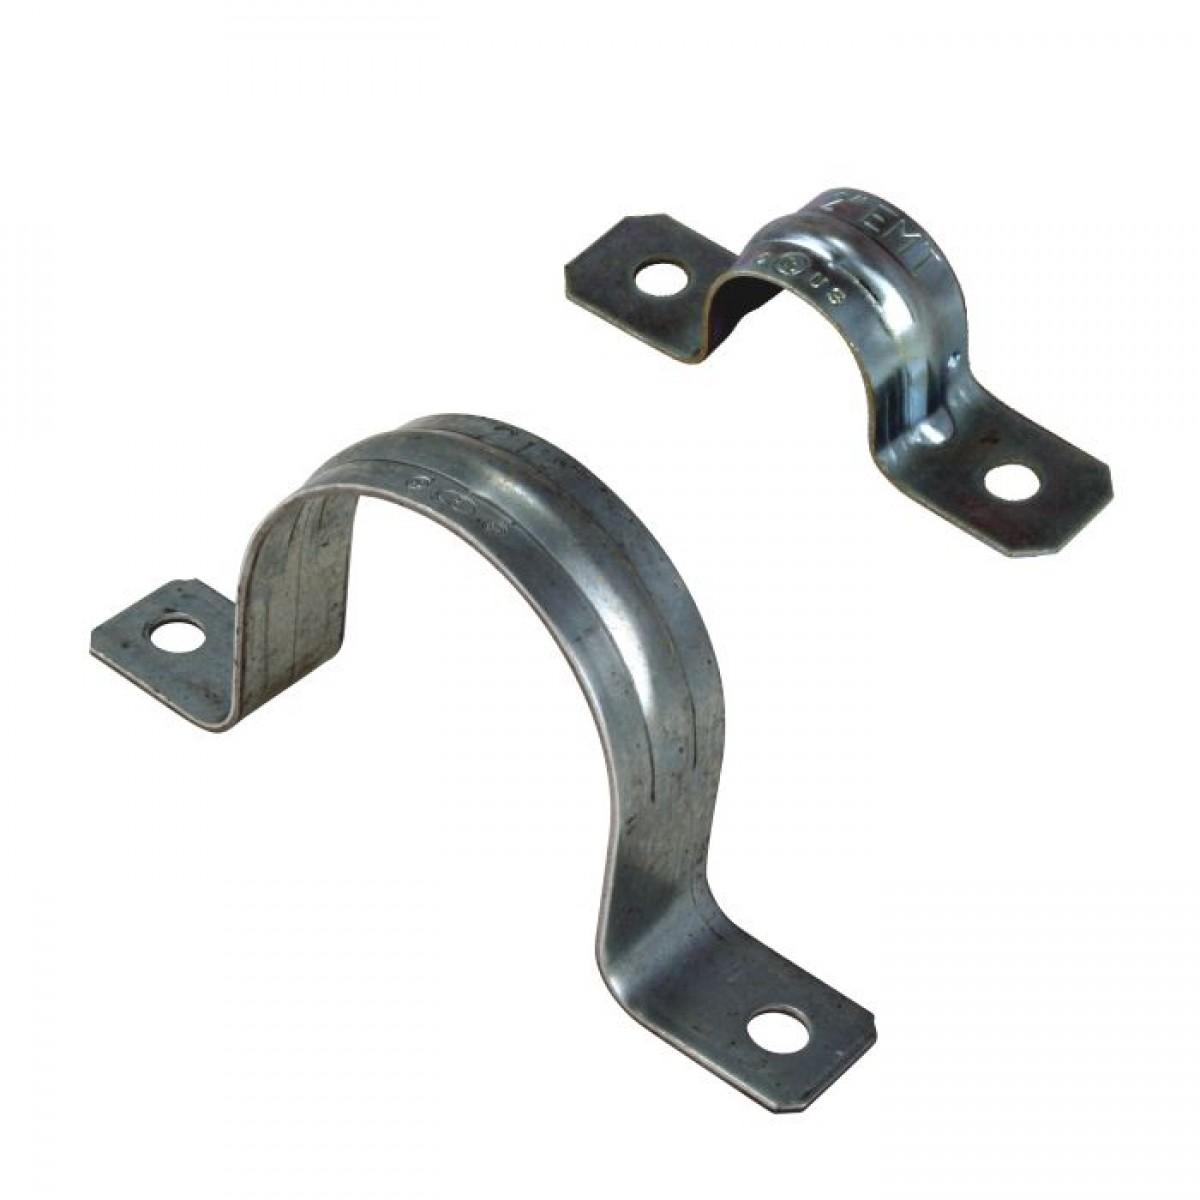 Emt straps hole conduit supports clamps